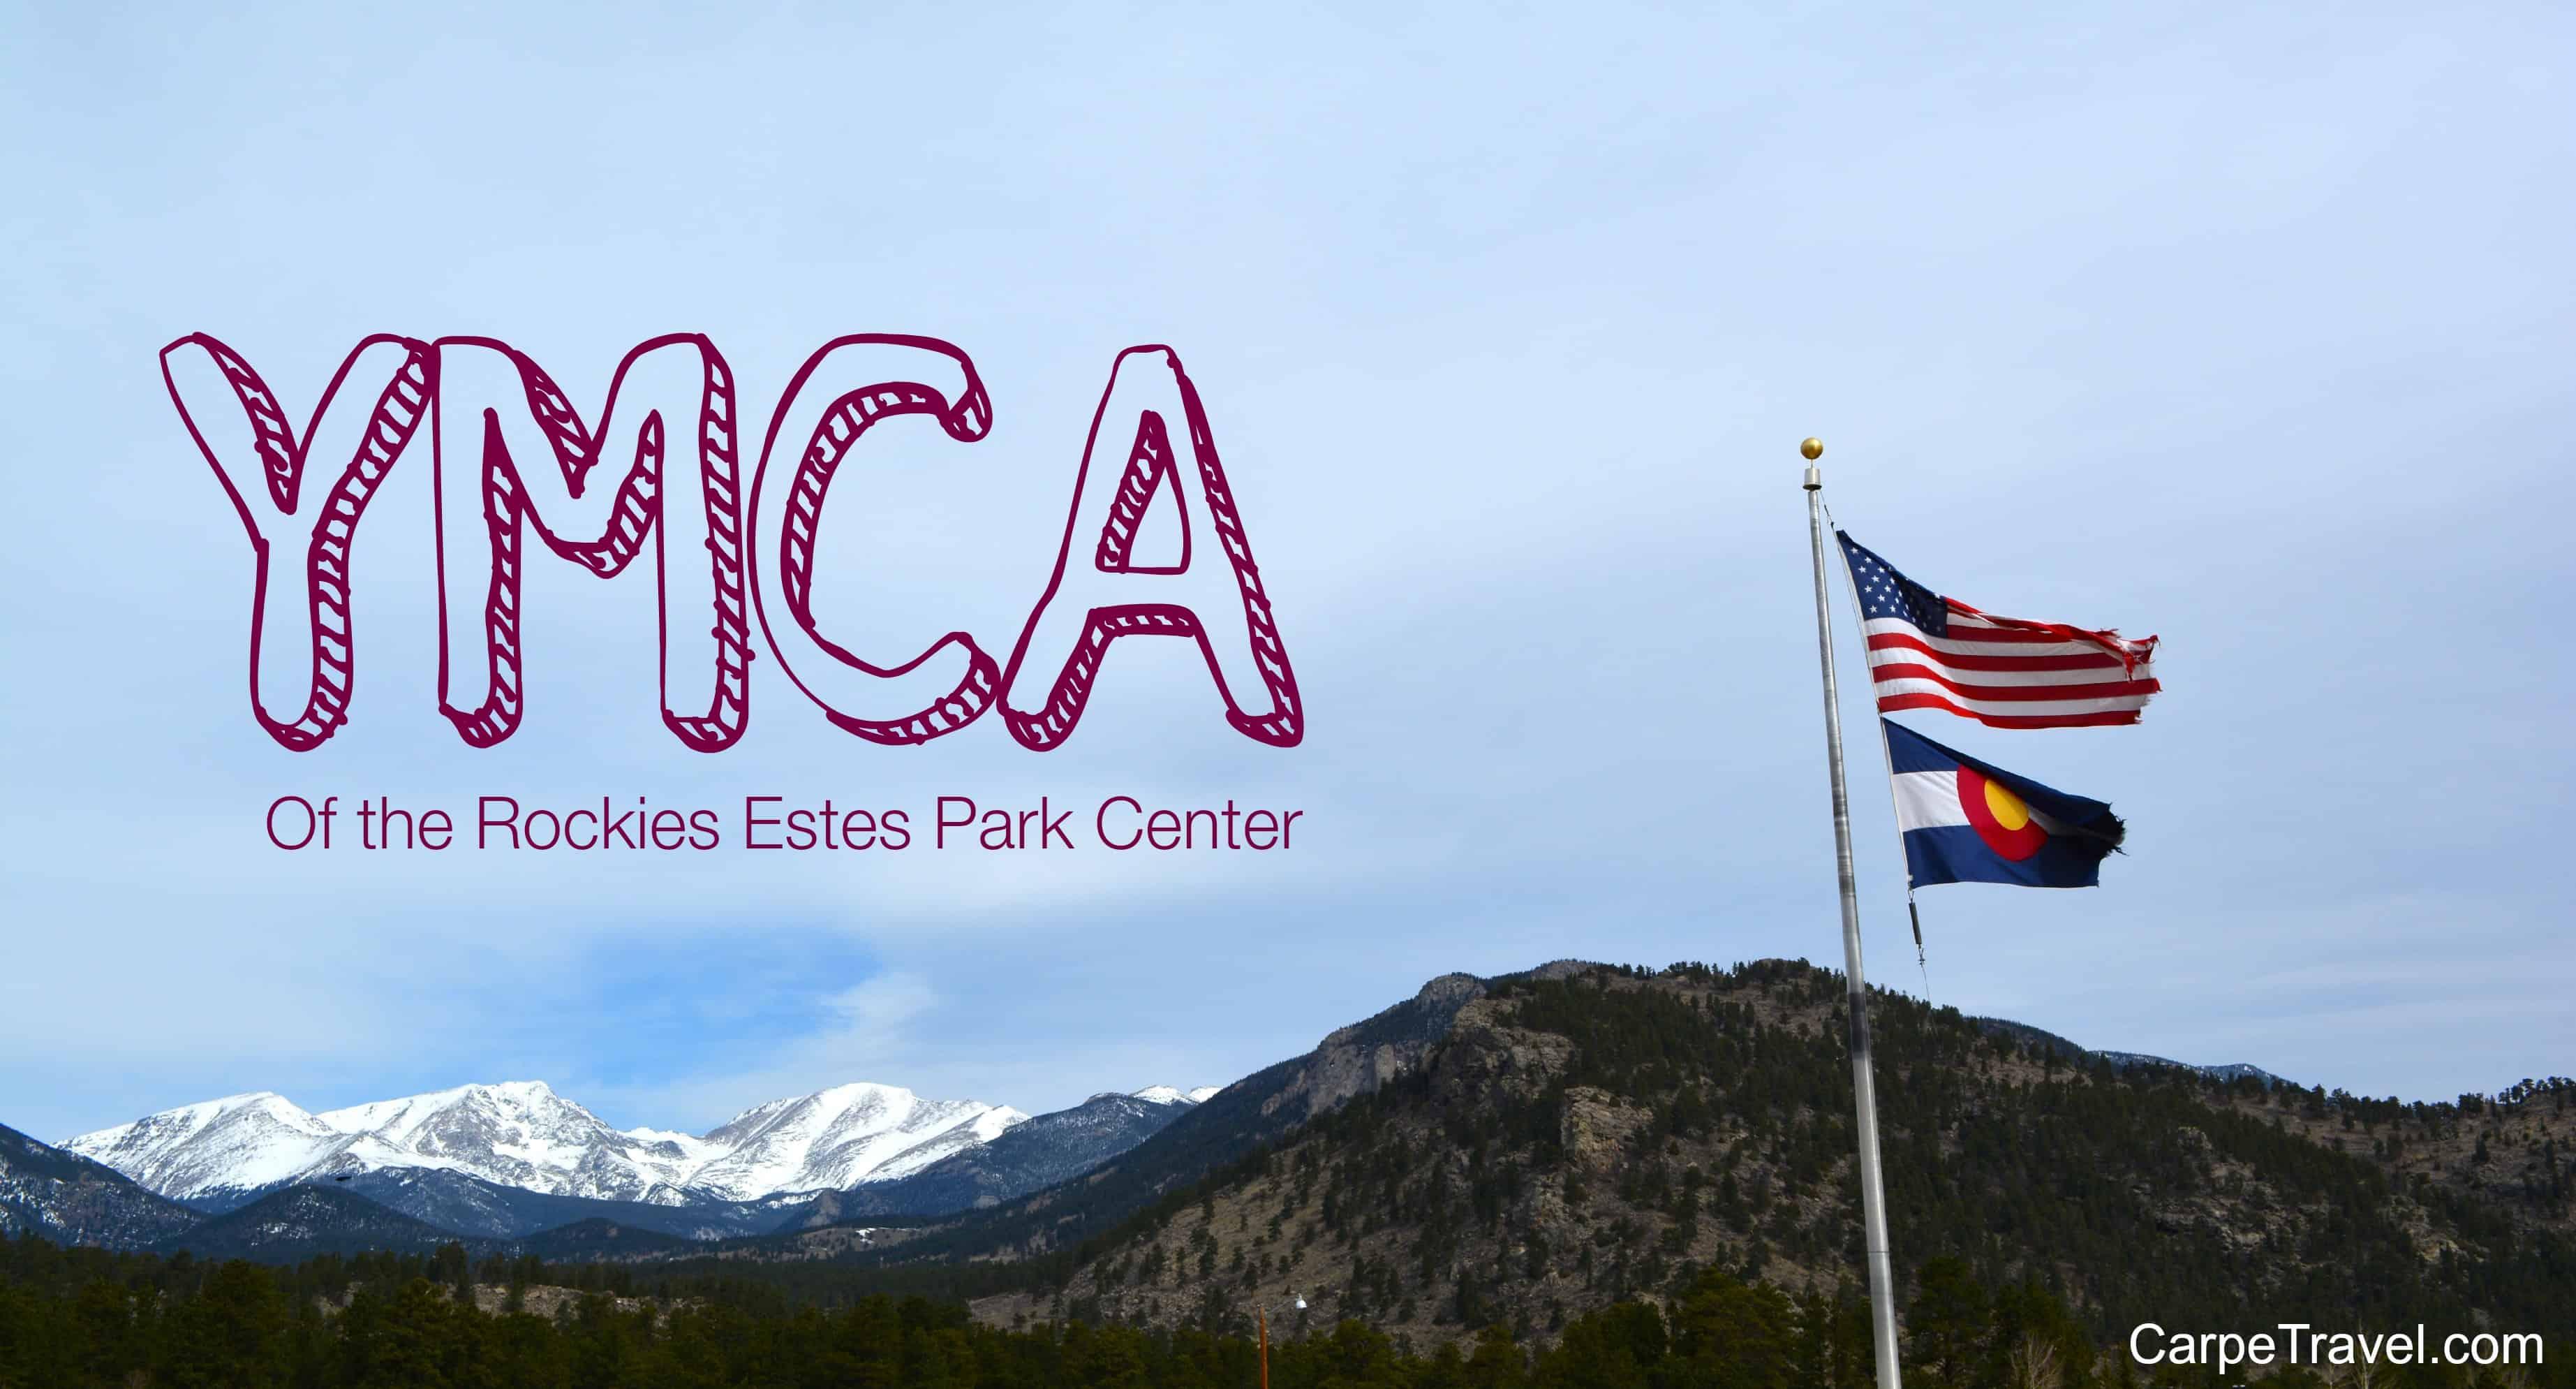 Check-In: YMCA of the Rockies Estes Park Center on rocky mountain national park cabins, estes park cabins, ymca camp seymour cabins, snow mountain ranch cabins, della terra mountain chateau cabins, ymca rockies yurt, colorado cabins,